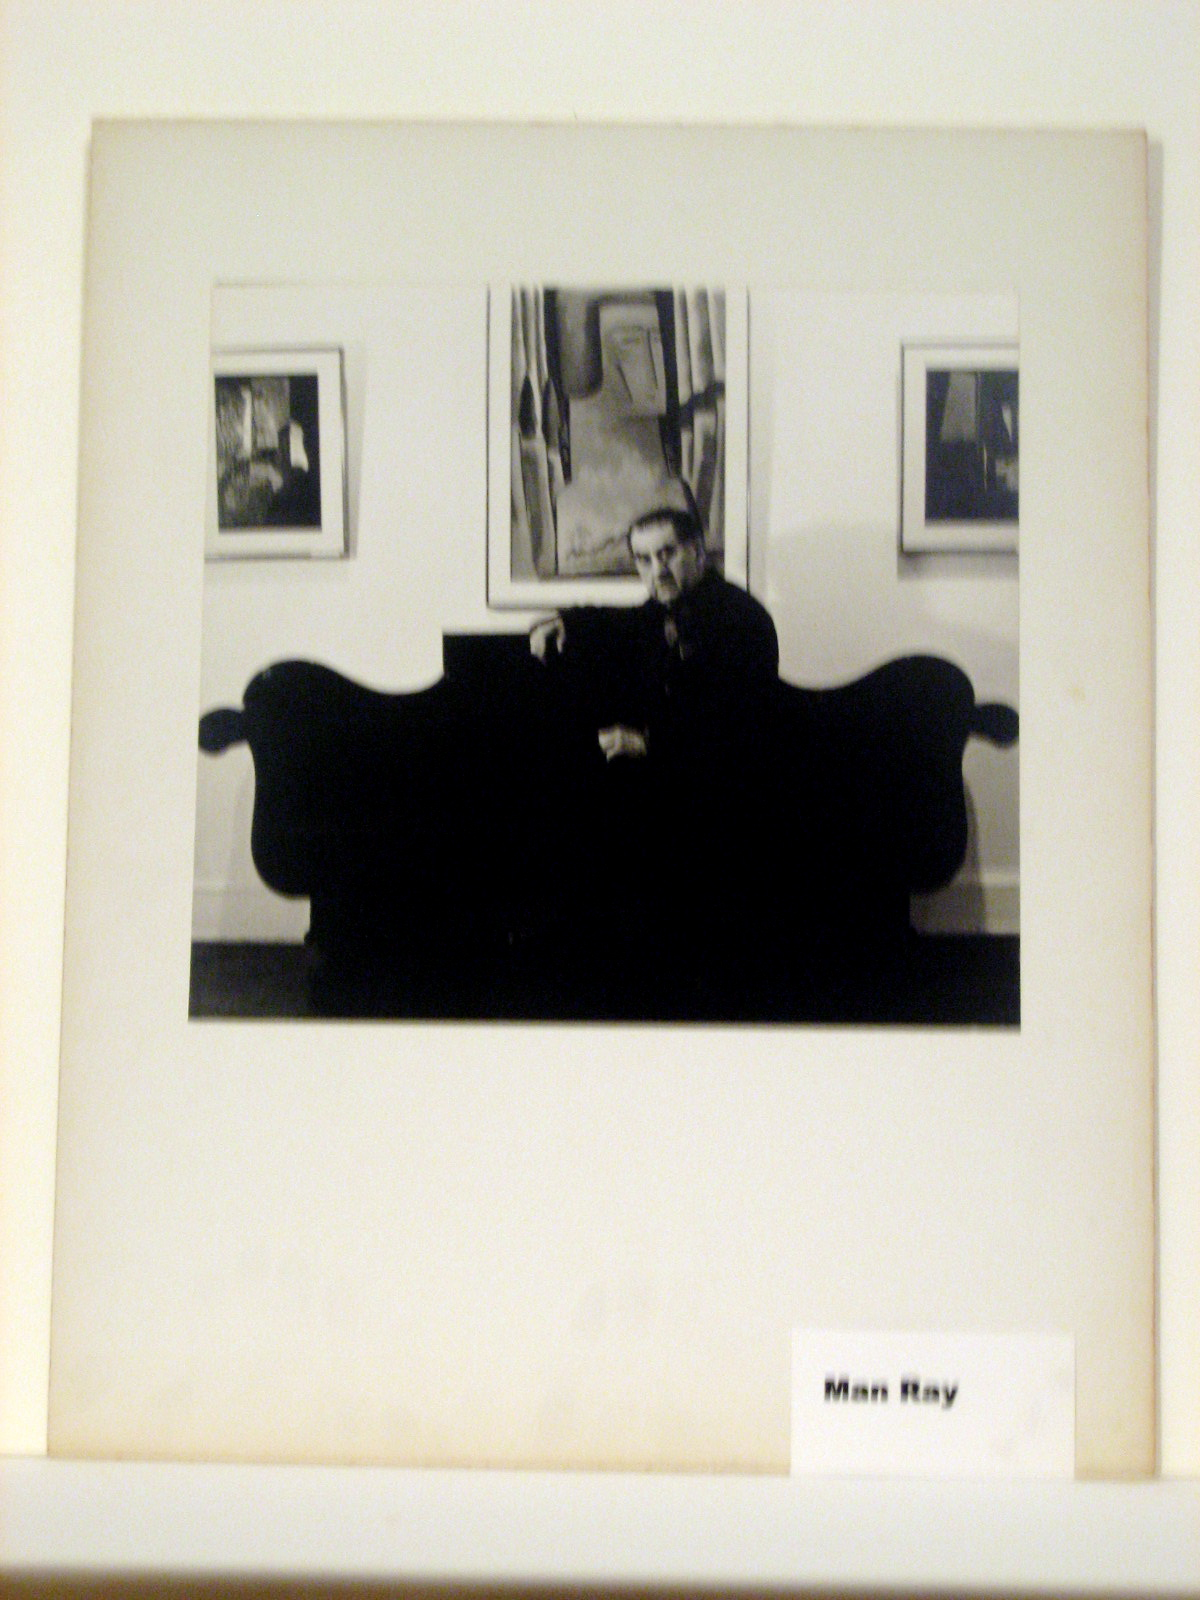 Man Ray 1.jpg